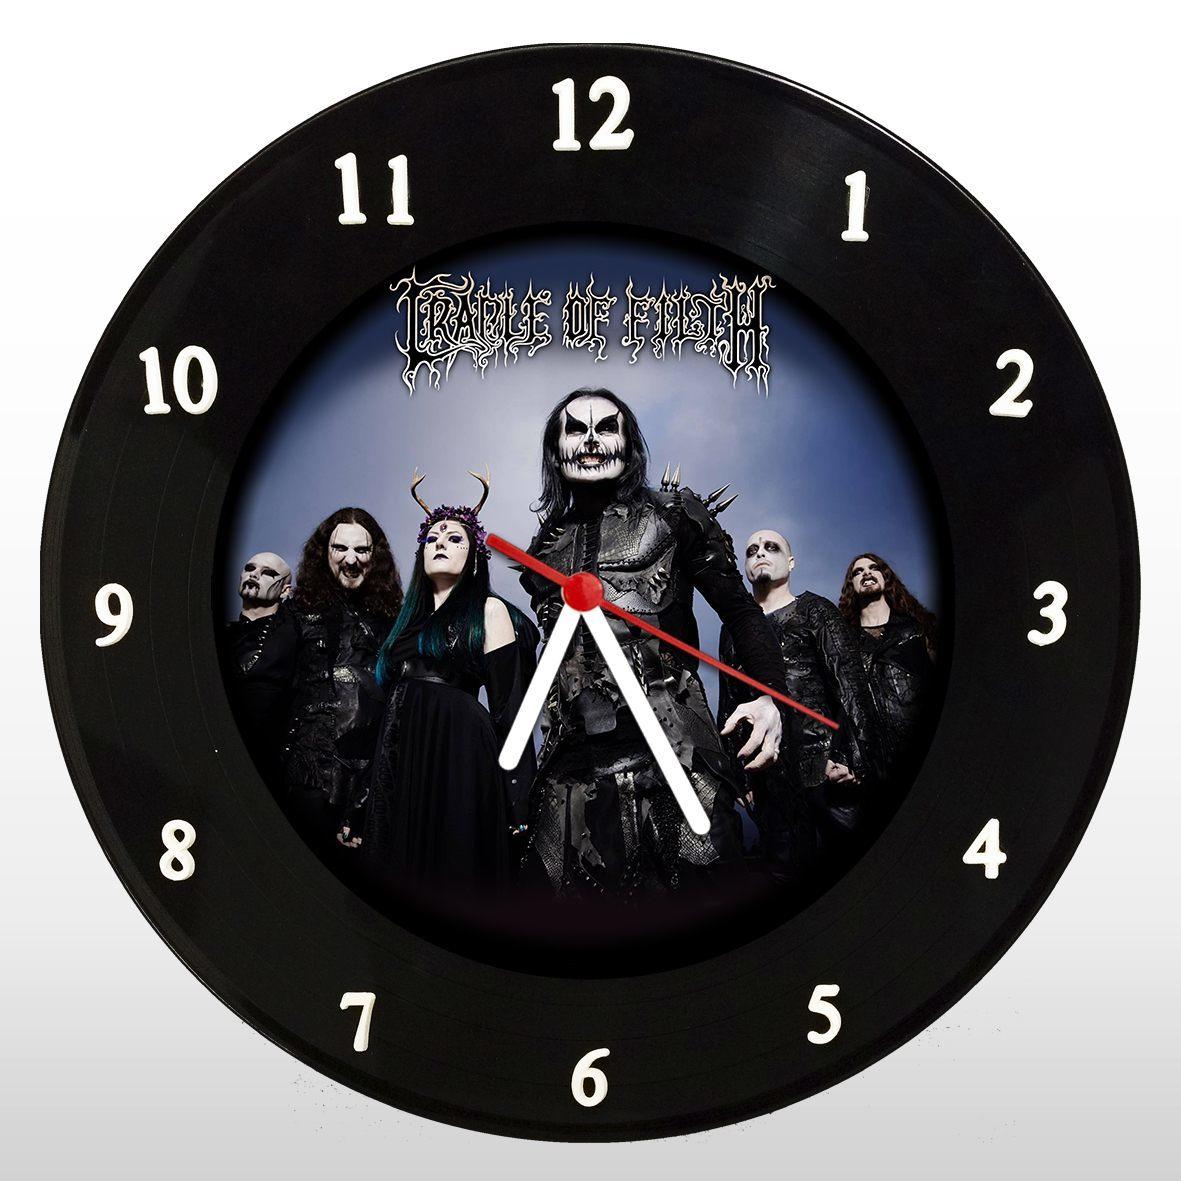 Cradle of Filth - Relógio de Parede em Disco de Vinil - Mr. Rock